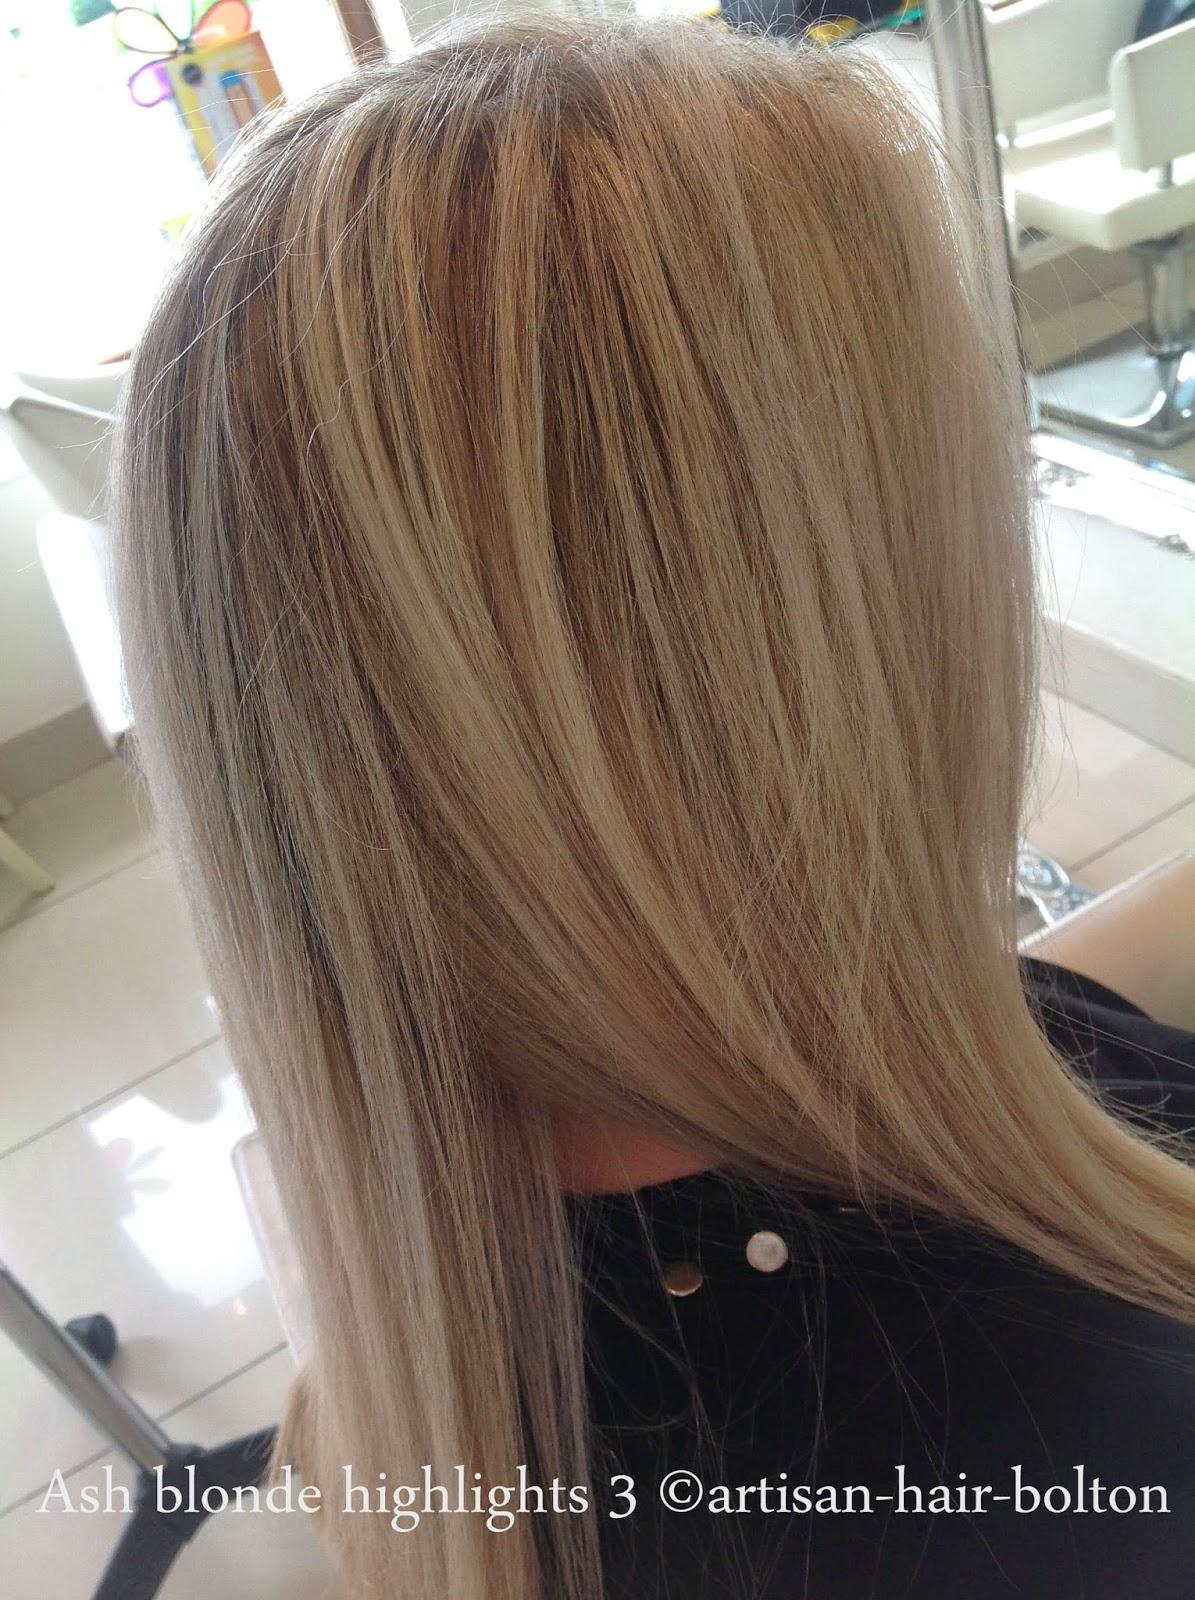 Artisan hair bolton blog colour ash blonde highlights